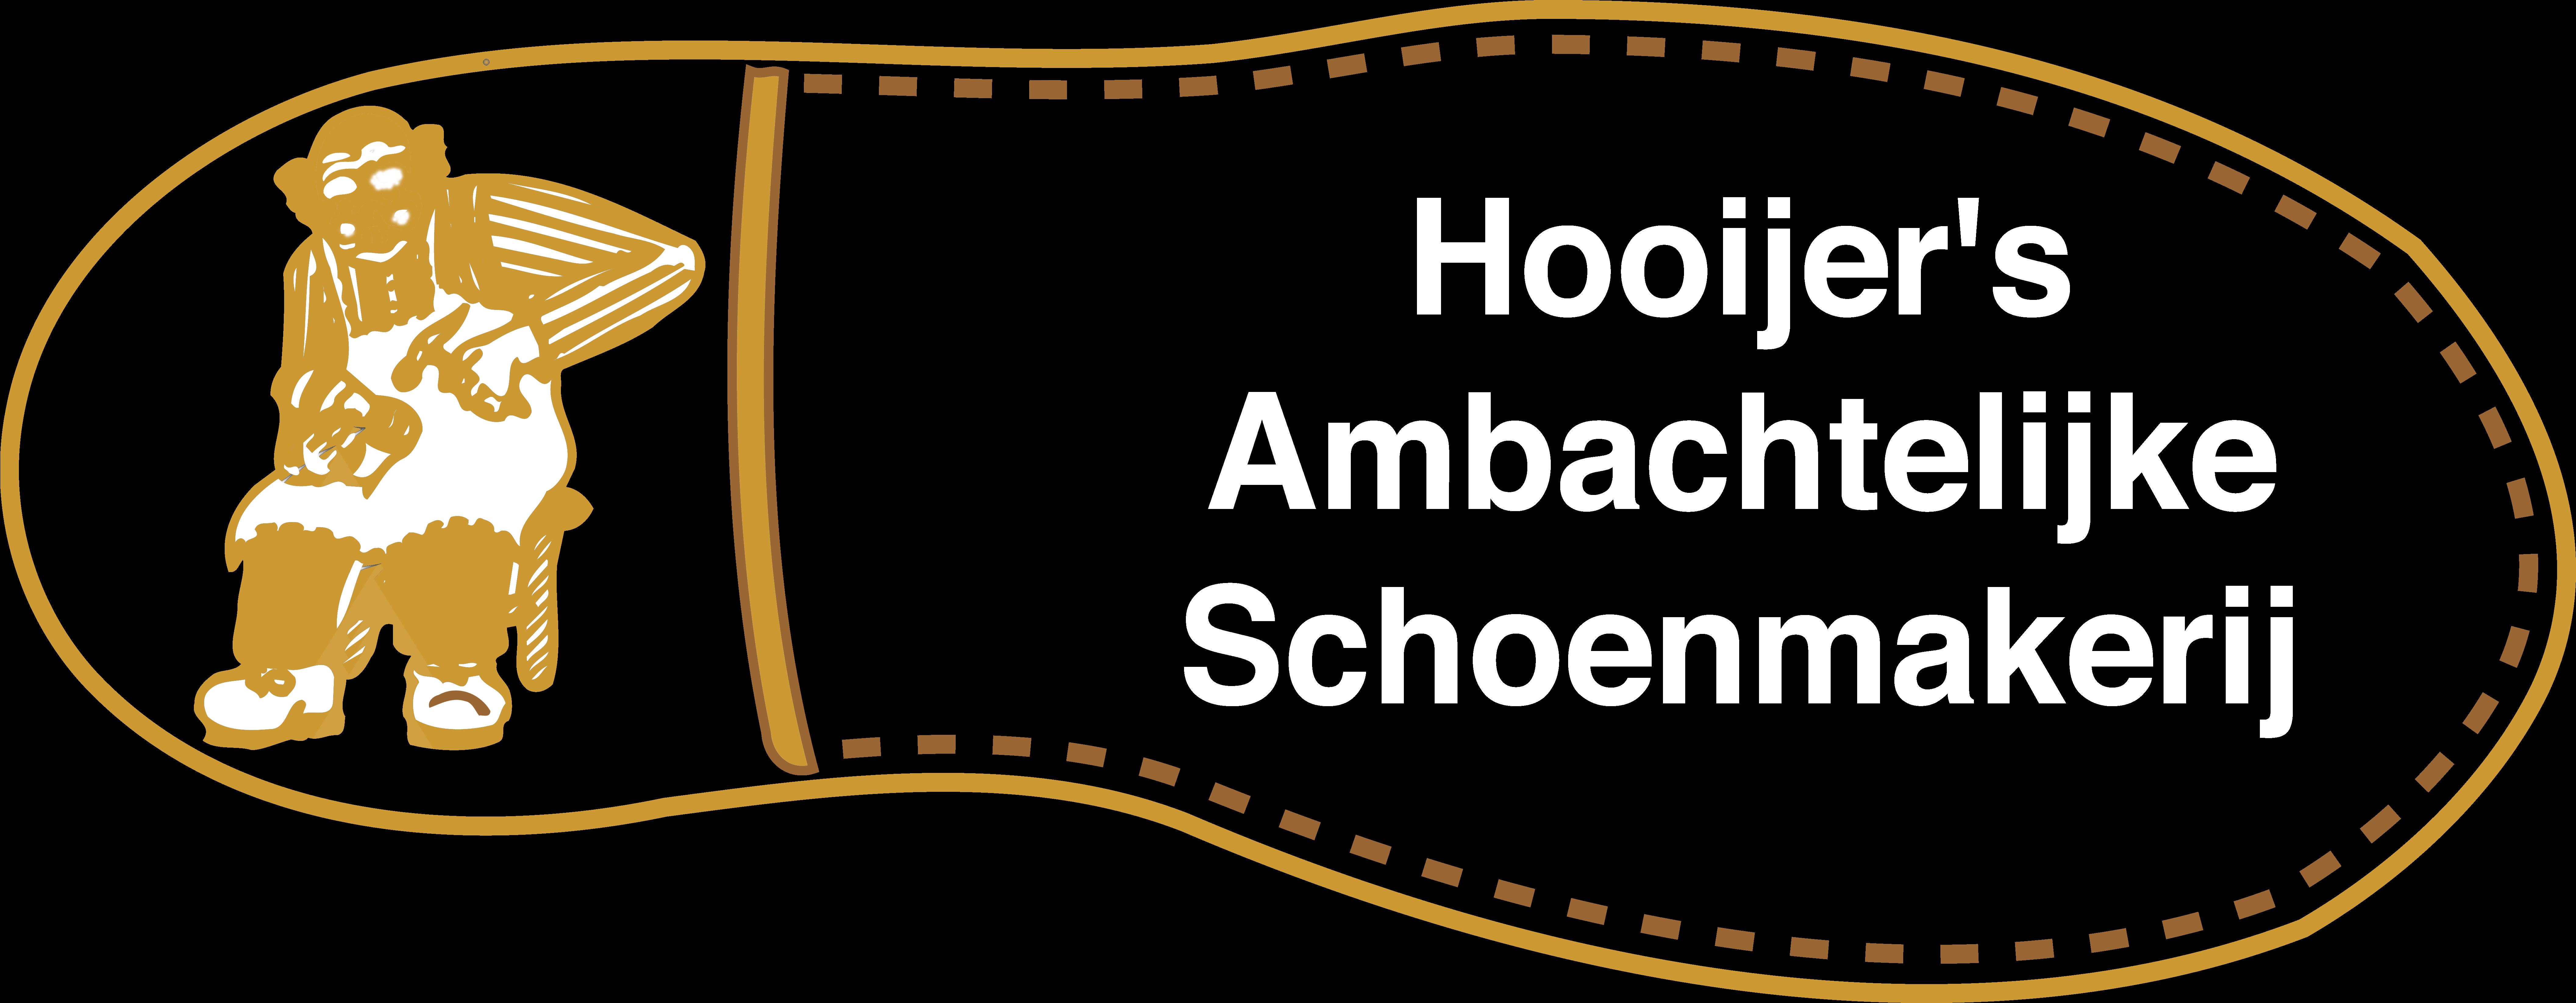 Hooijer_Logo-kleur-2.png